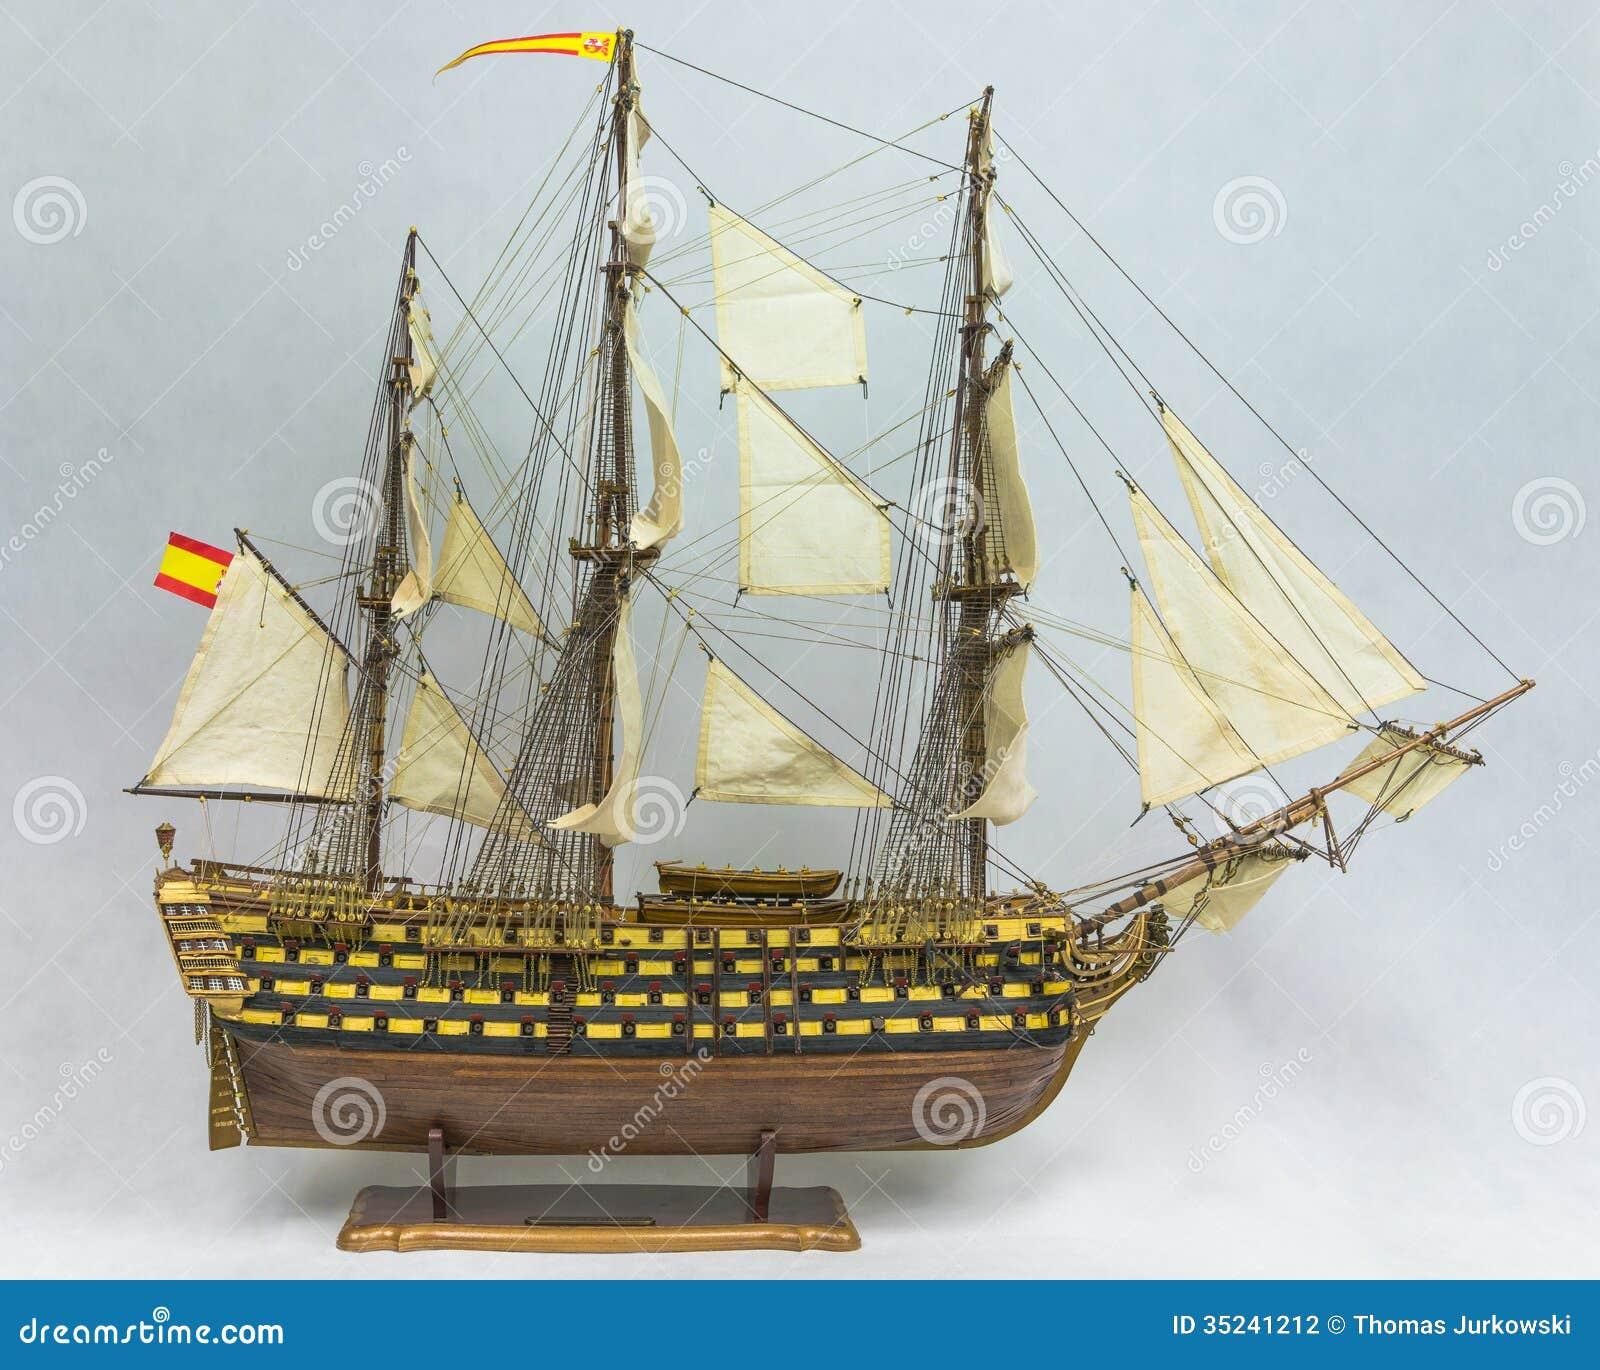 Sailing Ship Model Stock Photography - Image: 35241212